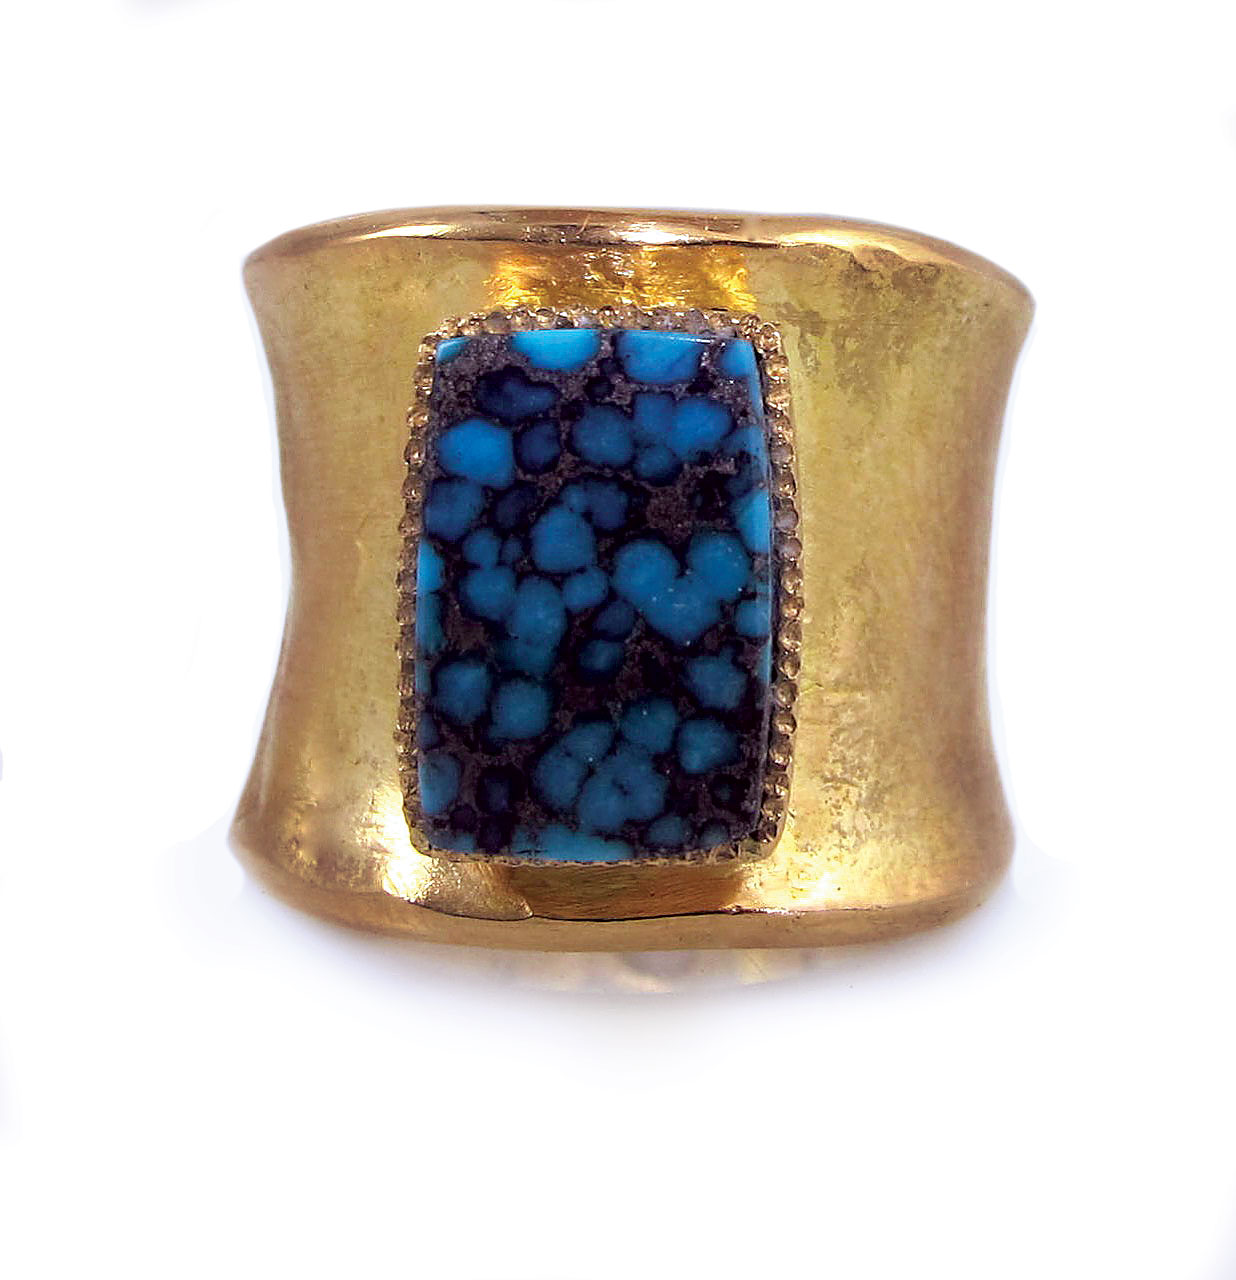 BISBEE TURQUOISE RING of eighteen karat yellow gold, Bisbee turquoise, white diamonds, 2.5 x 2.5 x 1.9 centimeters, 2015.